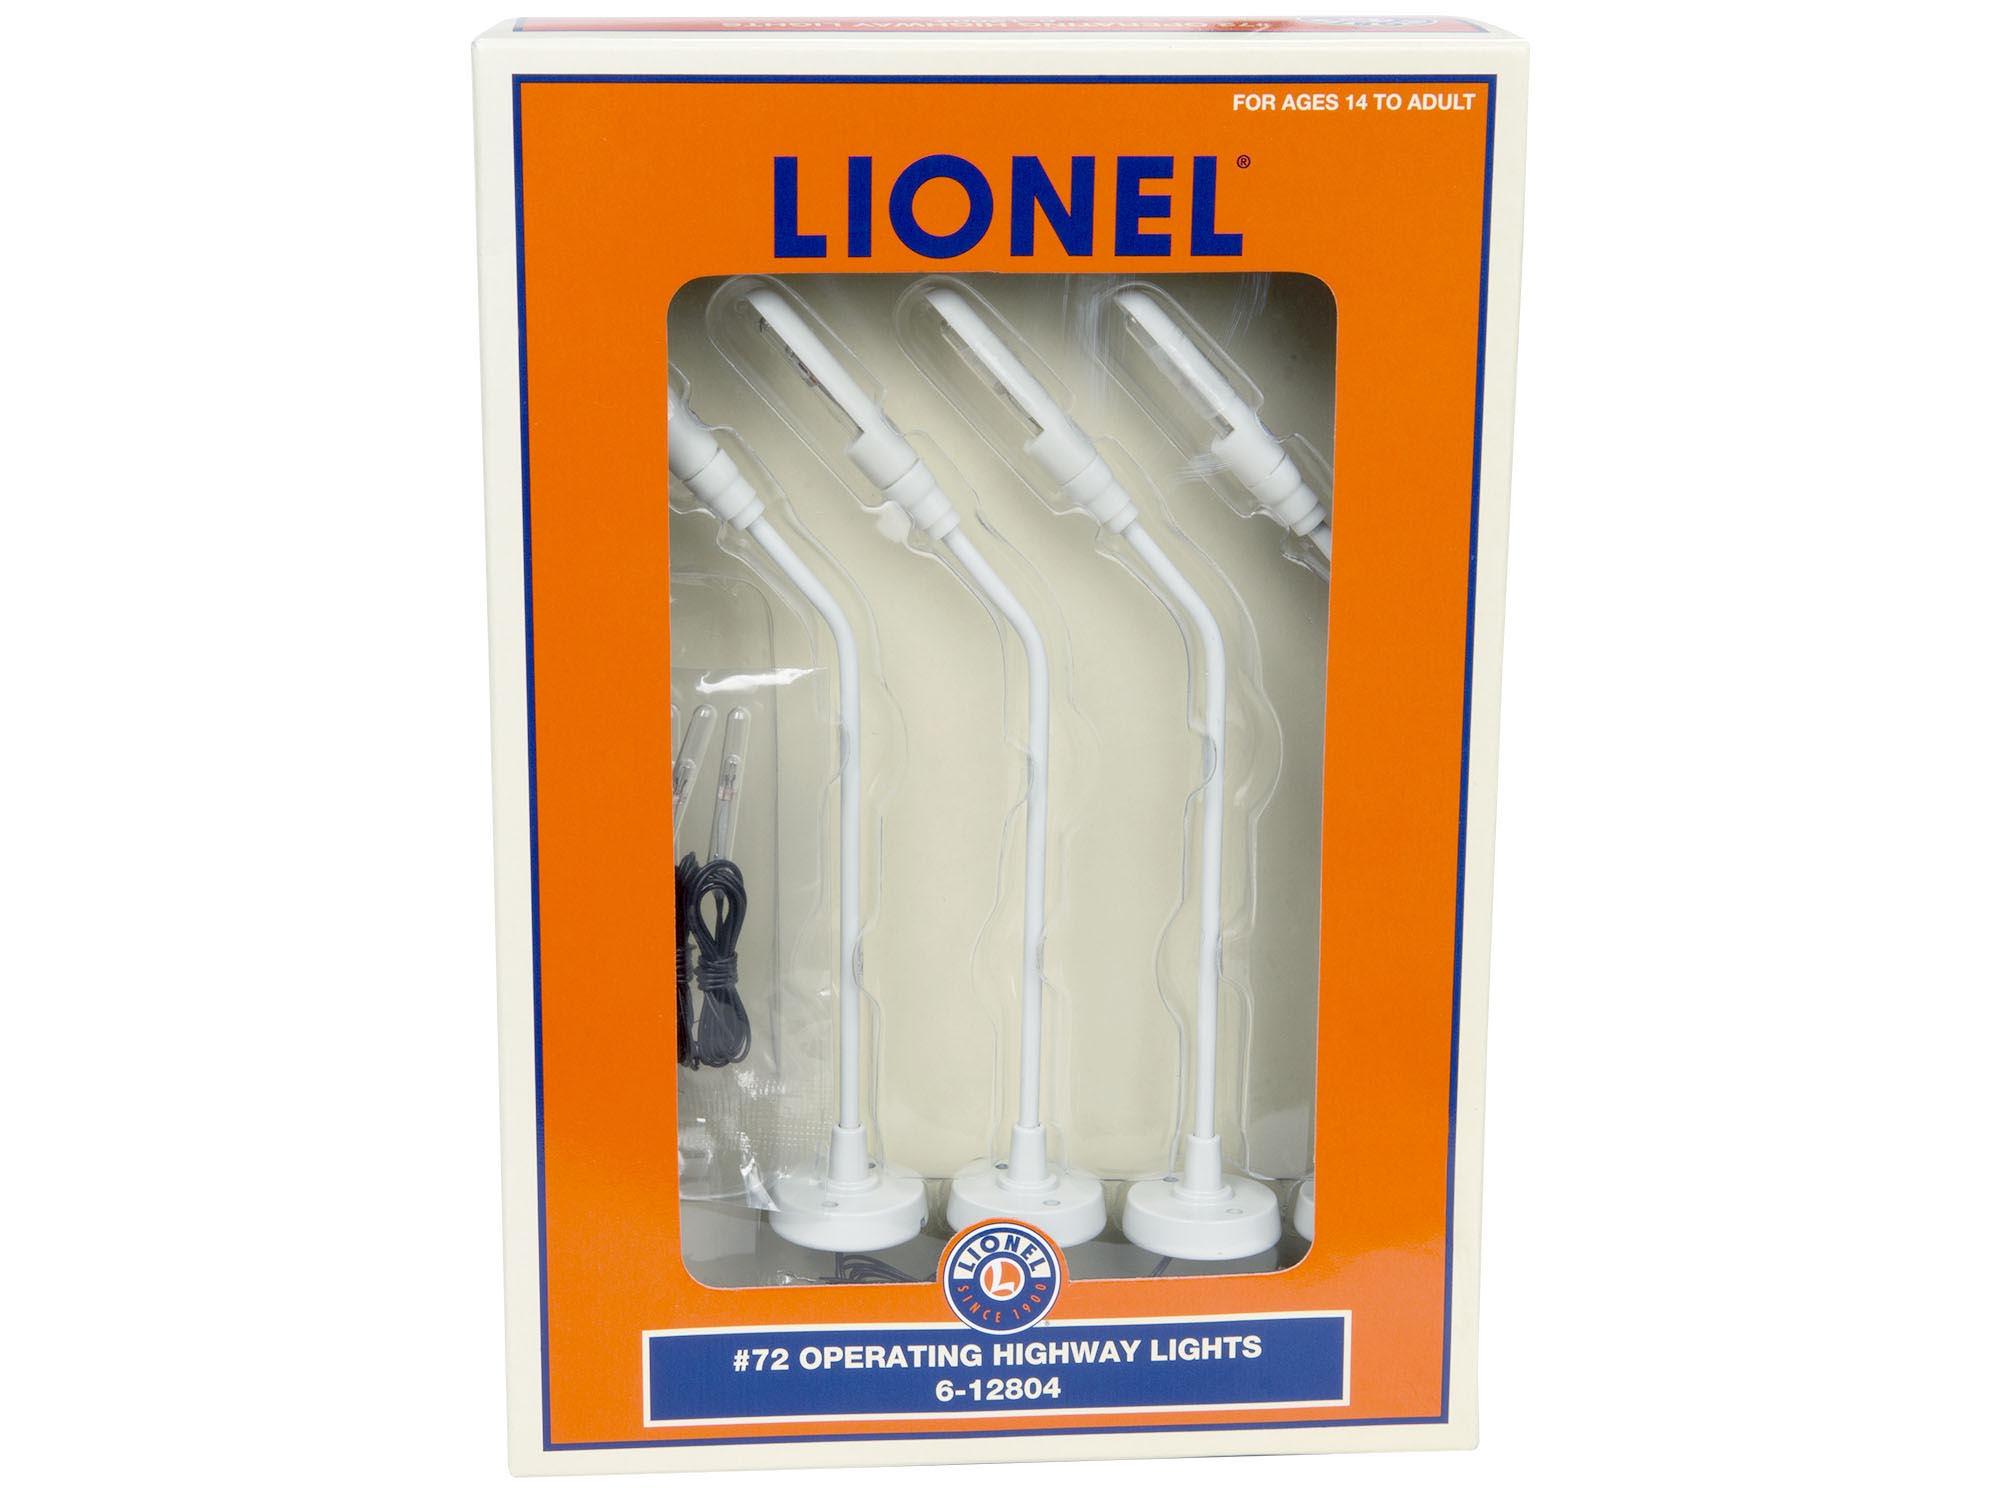 Lionel 6-12804 Lionel #72 Operating Highway Lights O 027 New 2013 set of 4